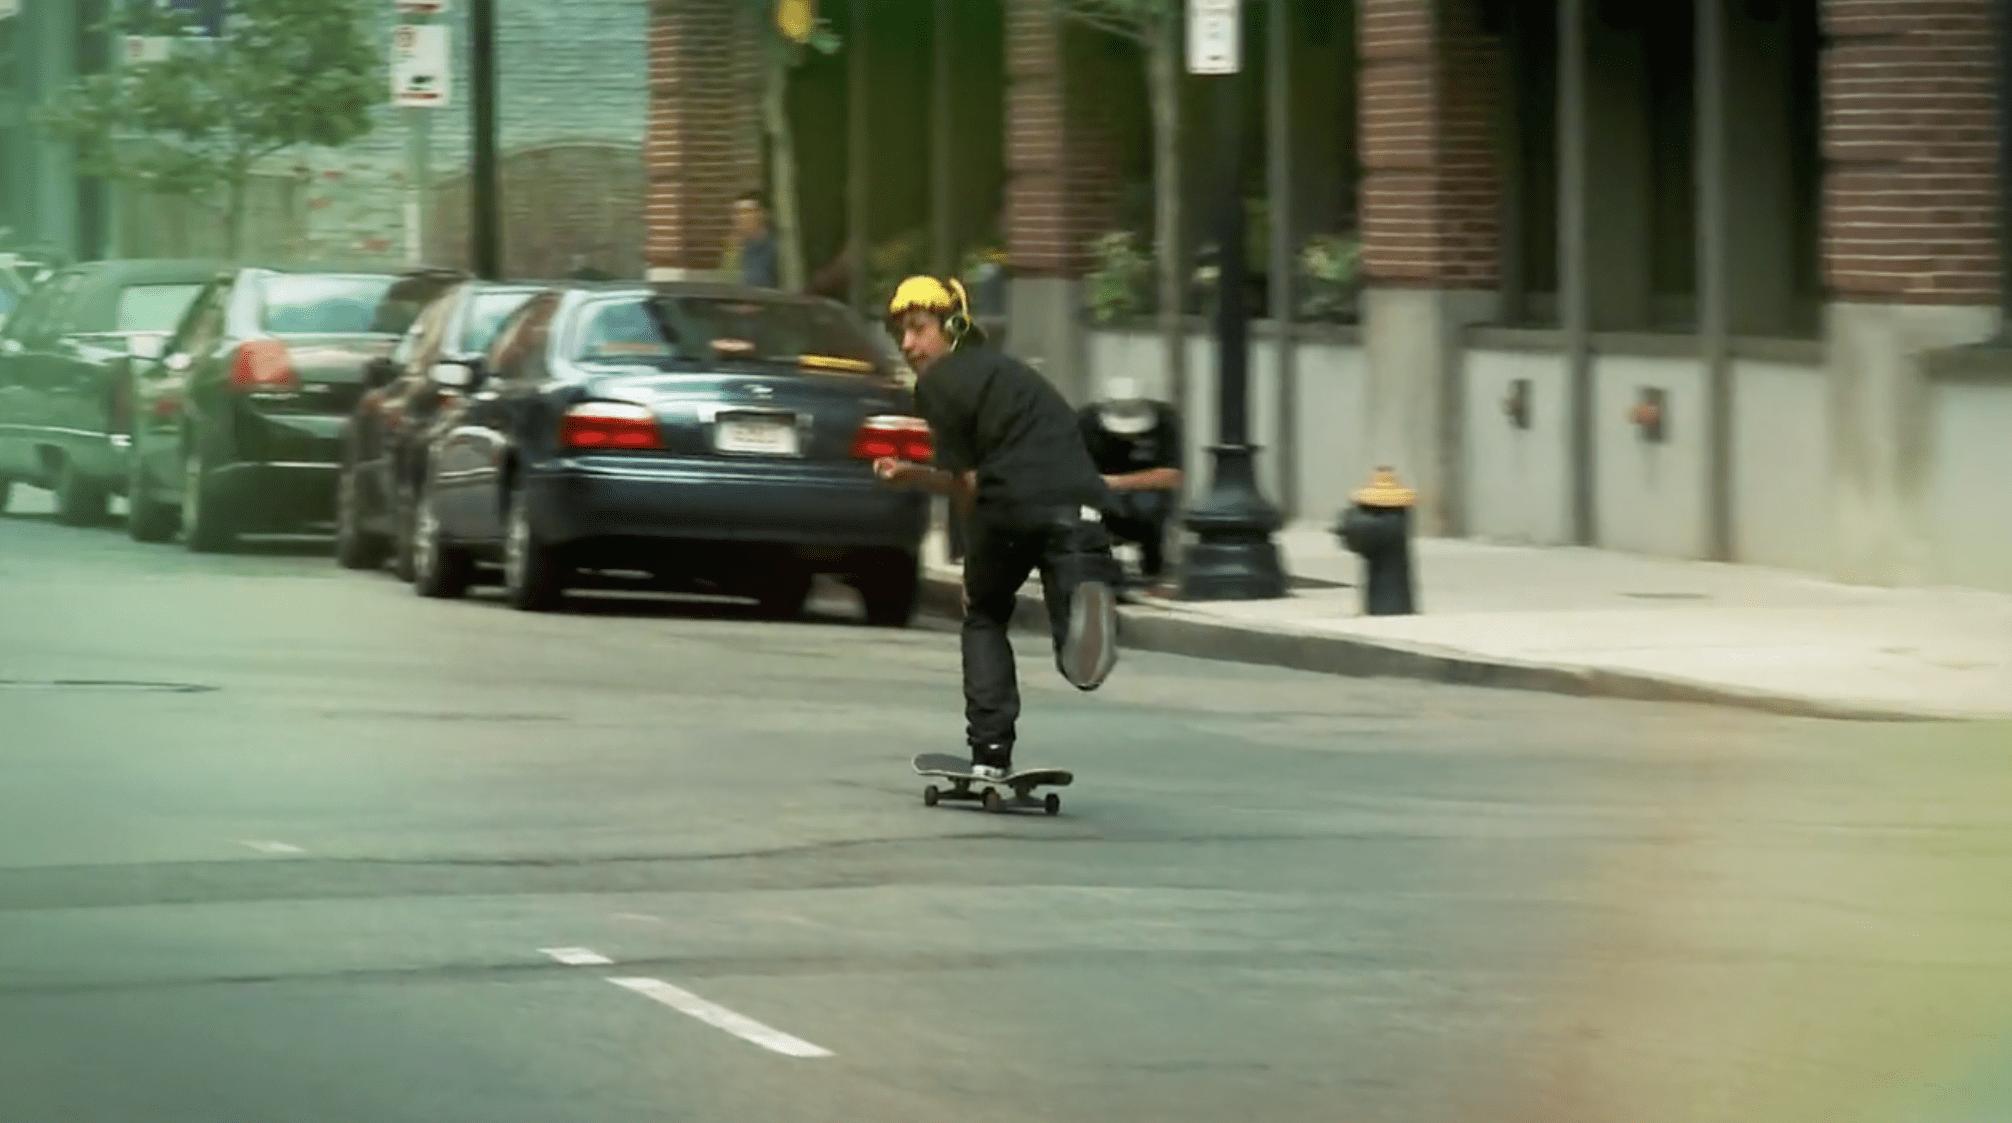 Skateboarder with Sony headphones